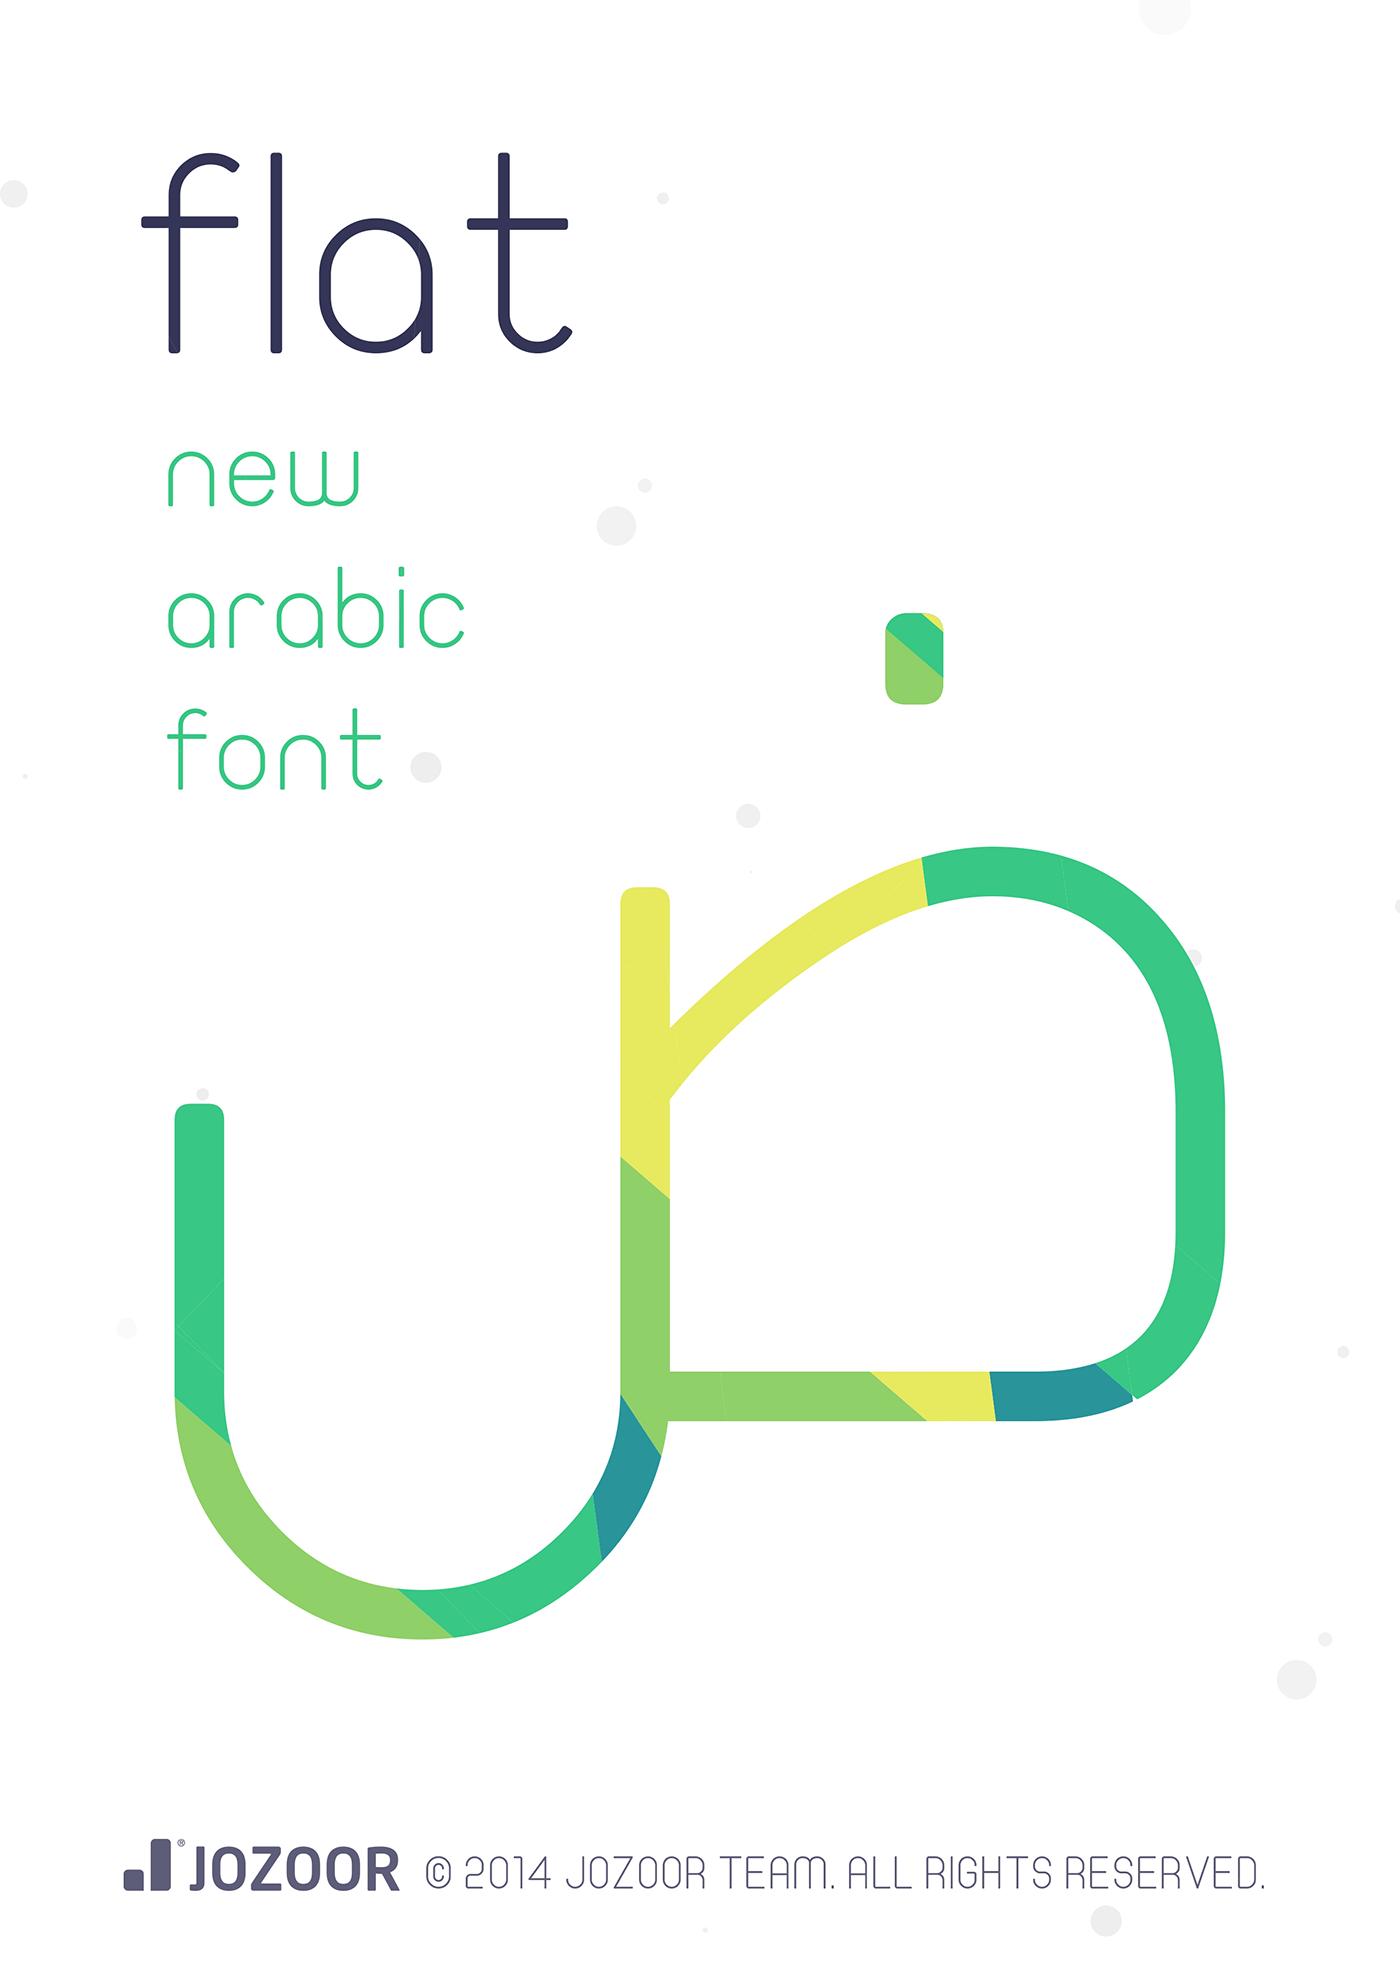 Flat Font خط فلات خط فلات خط عربى جديد من تصميم وبرمجة شركة جذور يظهر الخط في قائمة الخطوط العربية باسم Jf Flat ويعمل على Free Font Arabic Font Fonts